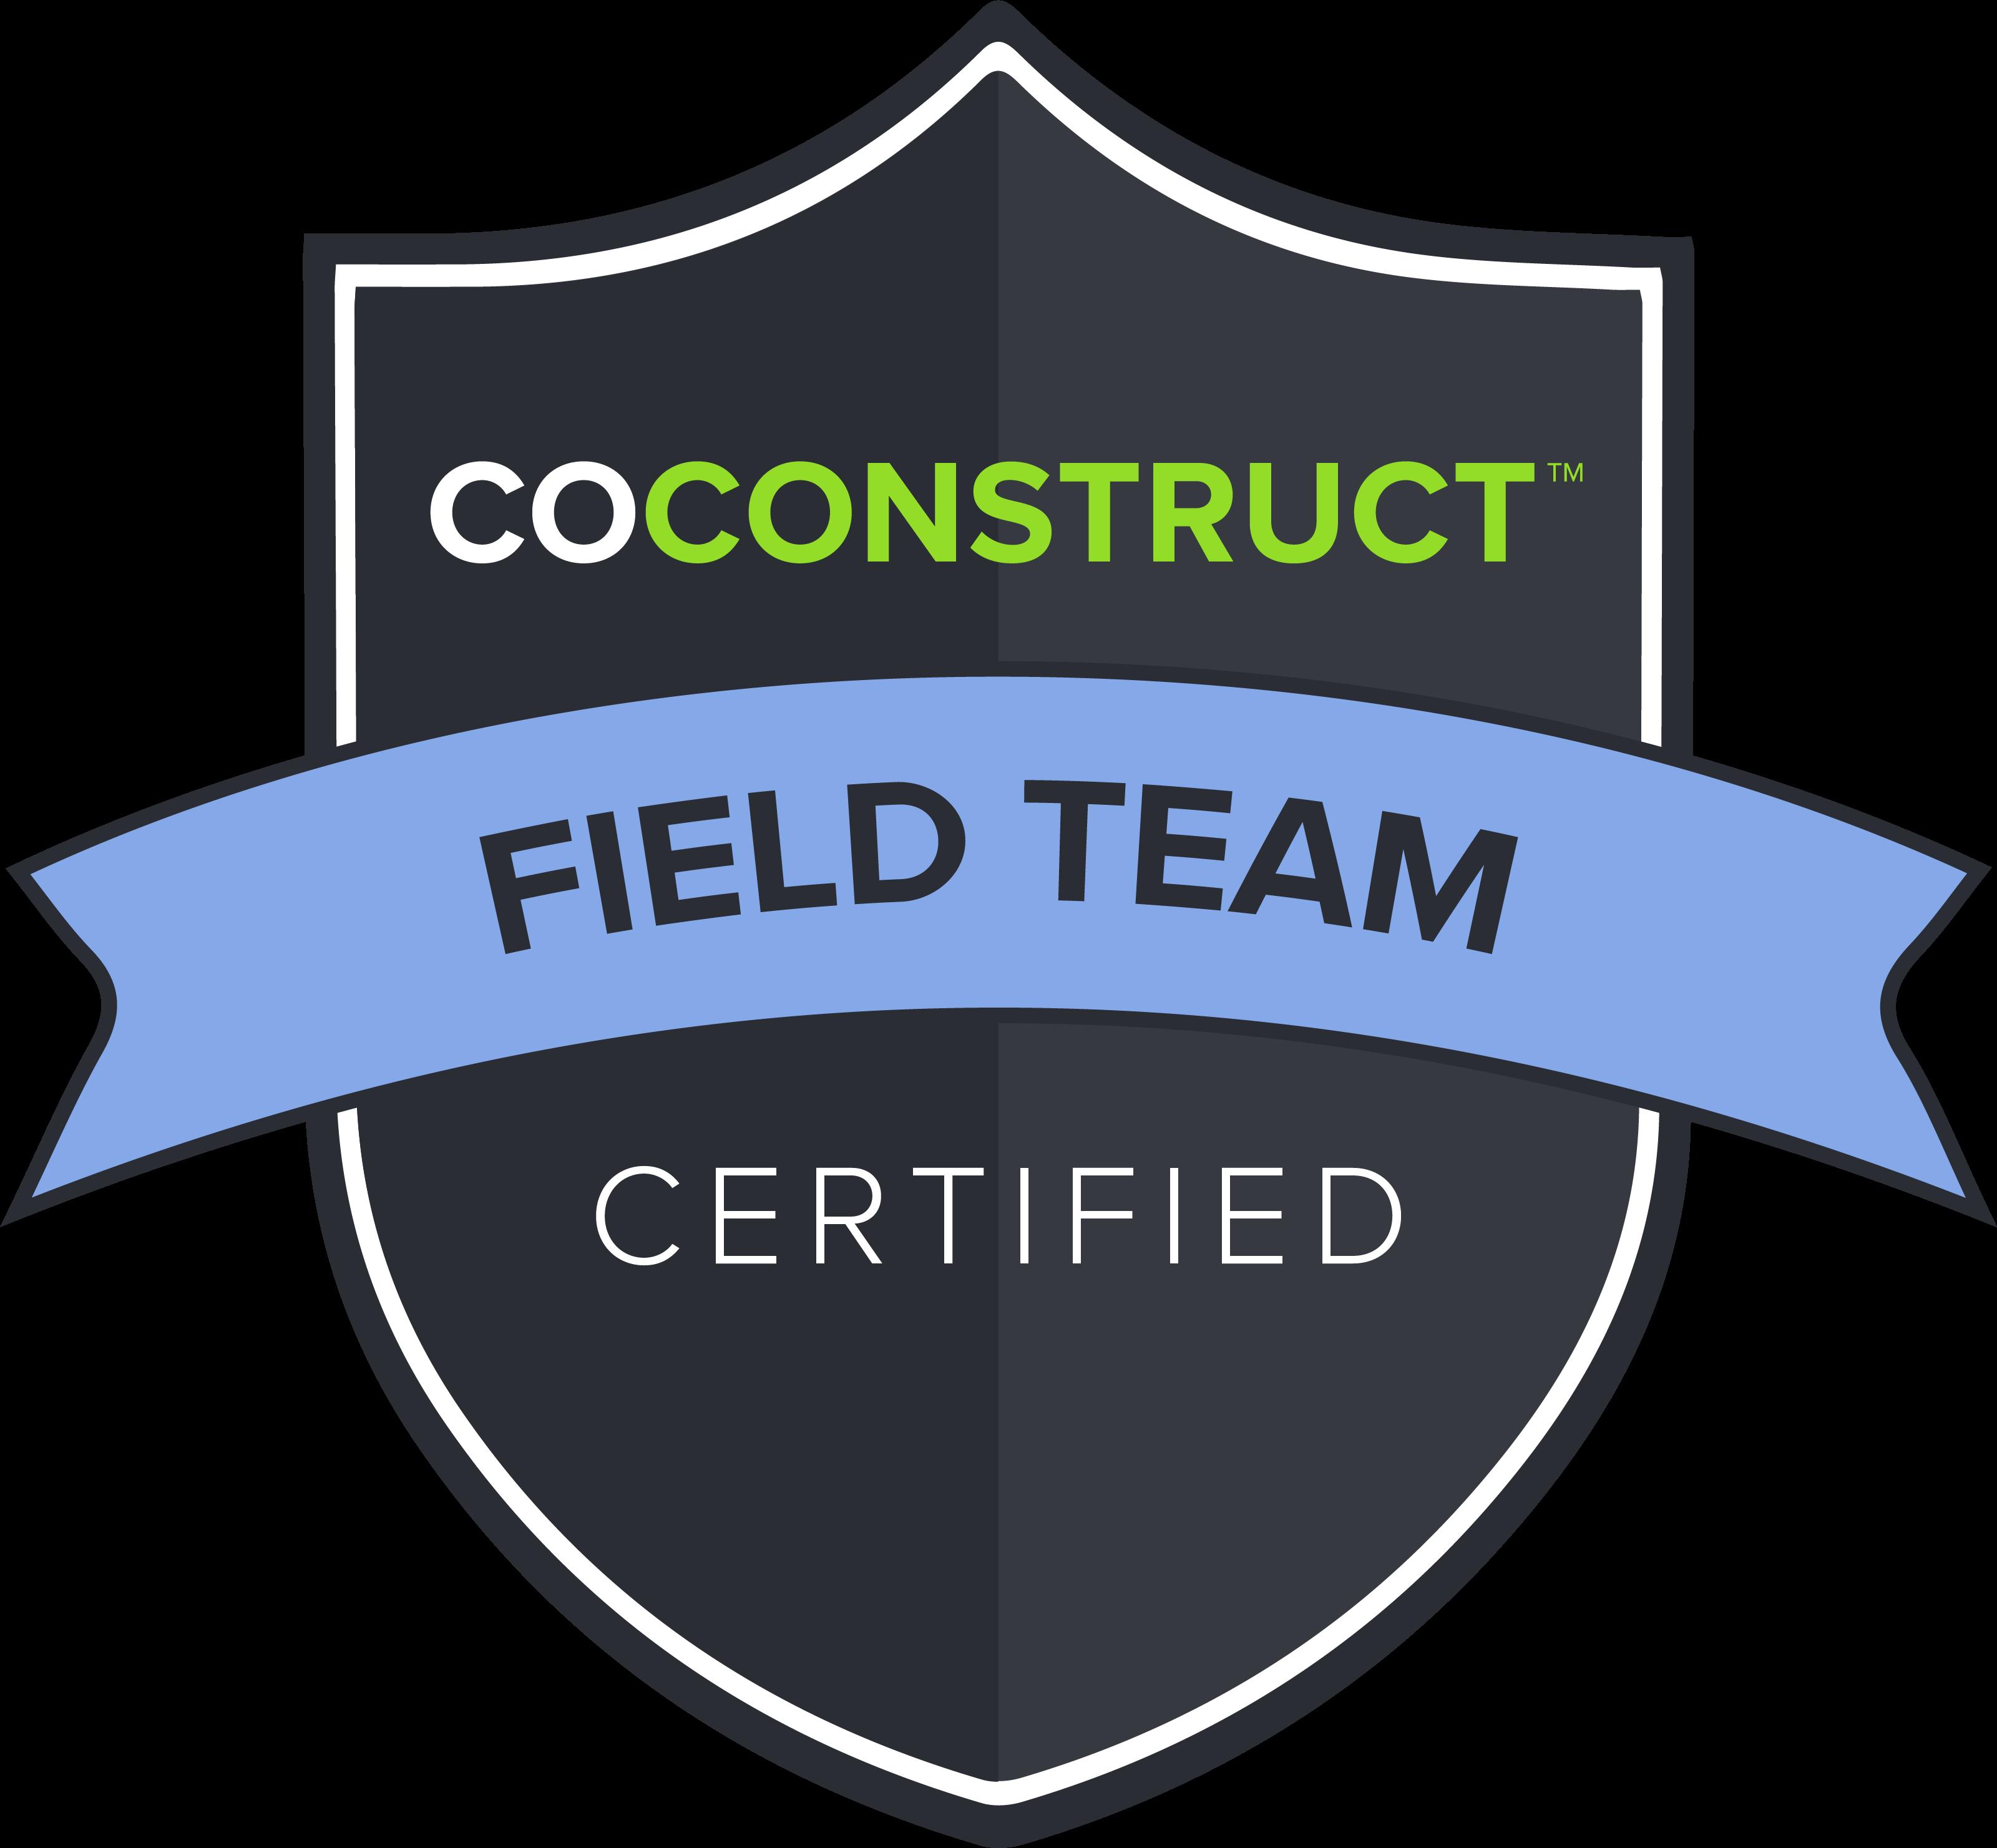 CoConstruct Field Team Badge